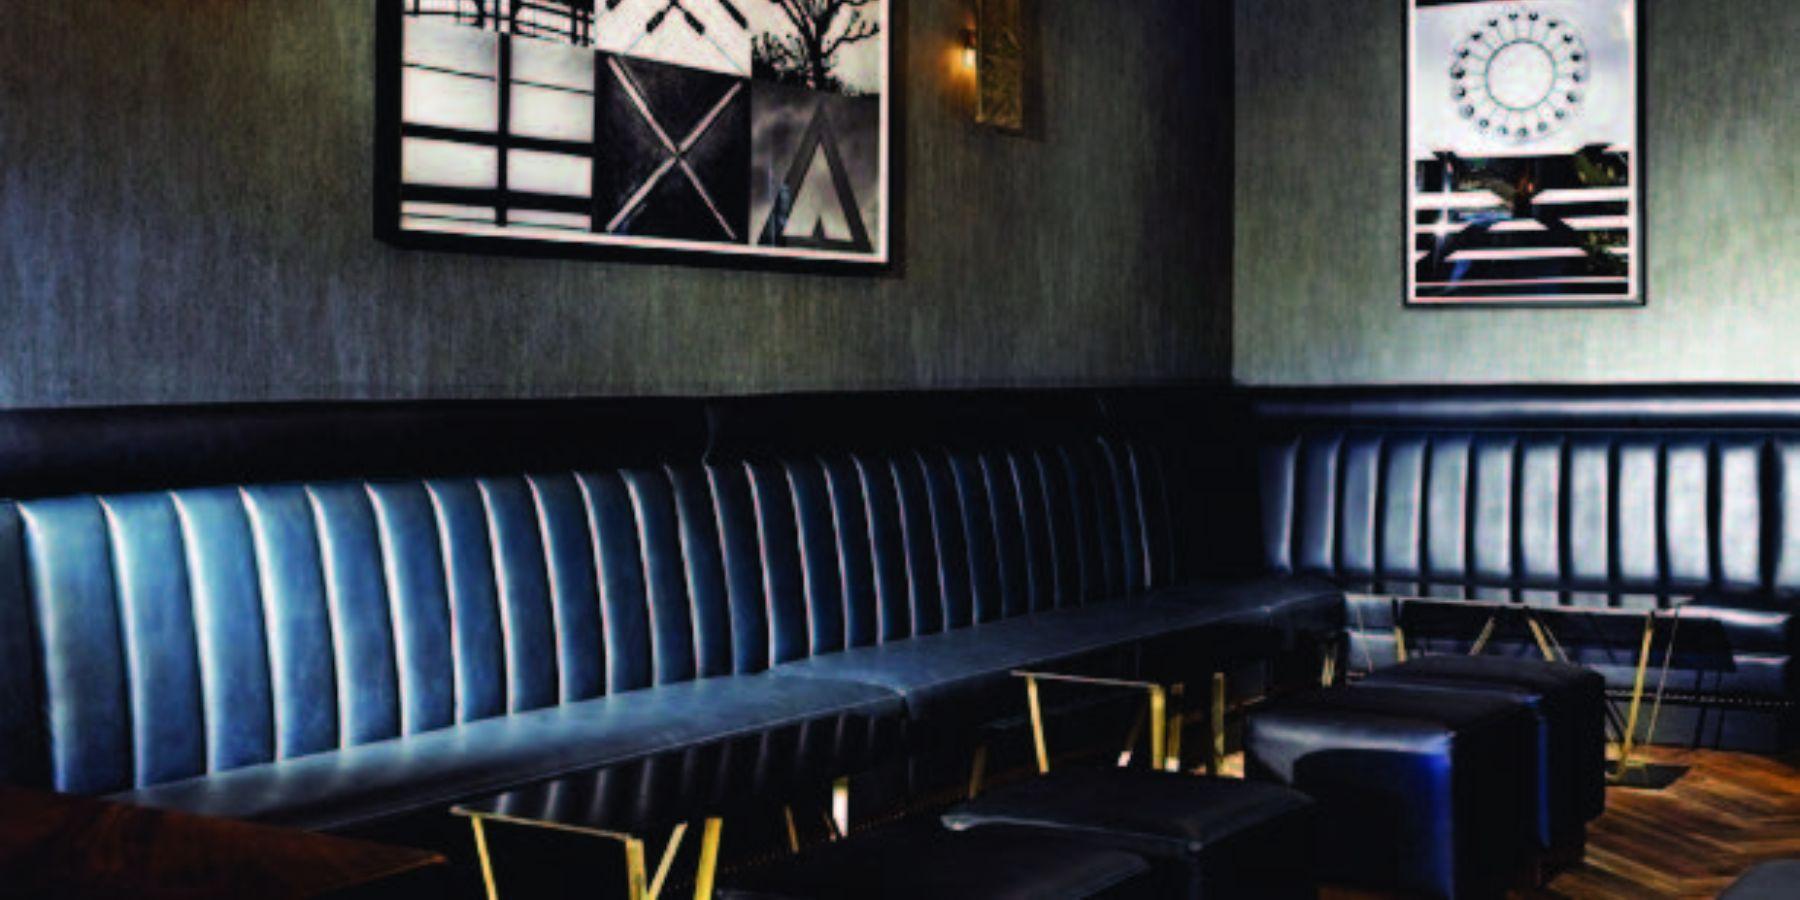 black dark imagery fixed seating